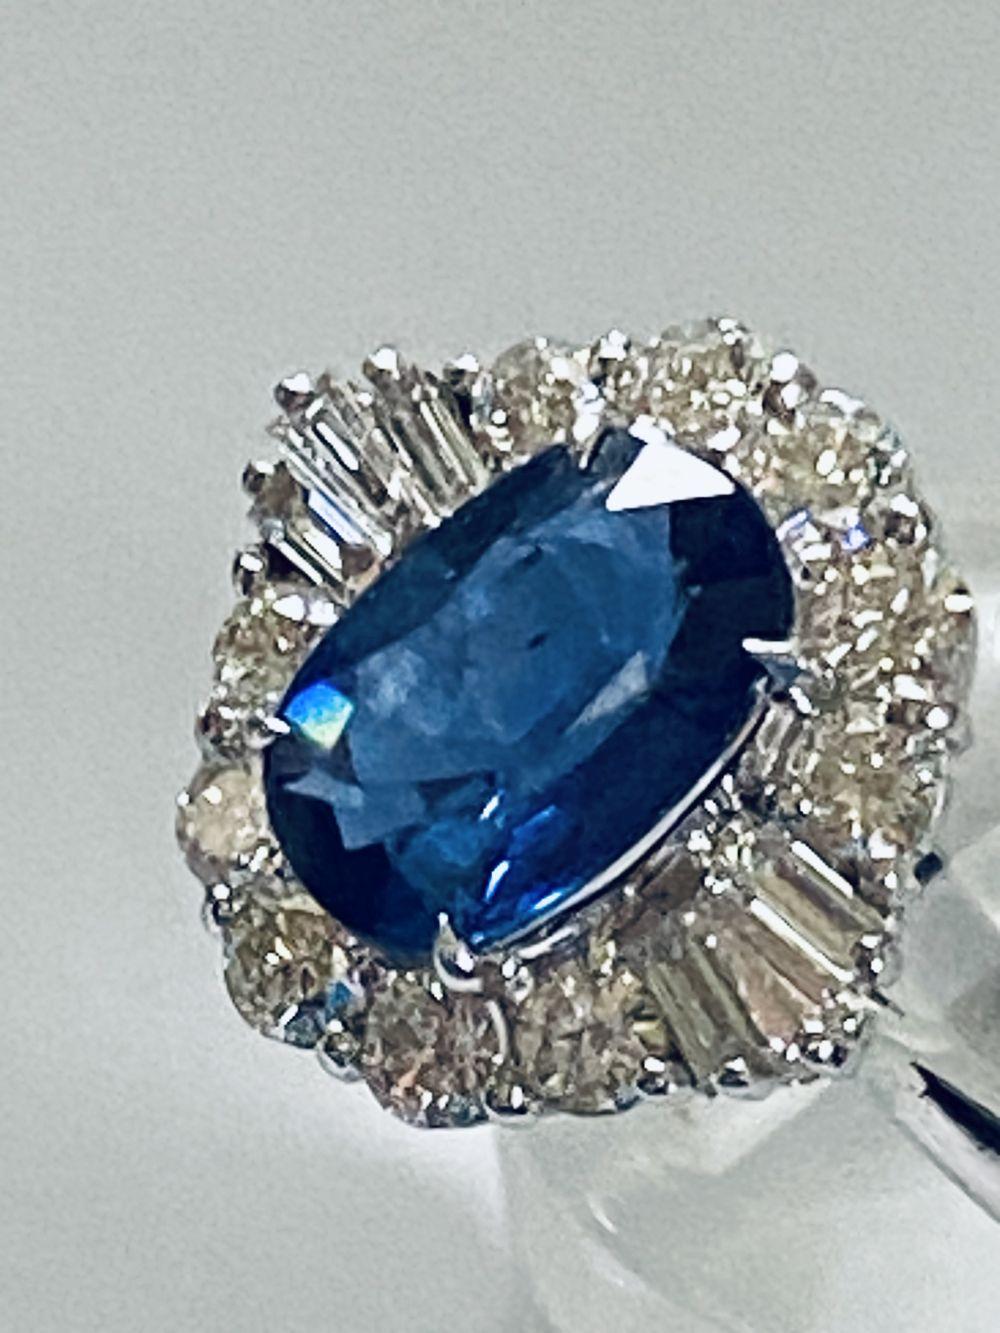 ART DECO DIAMOND AND CEYLON SAPPHIRE CLUSTER RING - Image 3 of 7